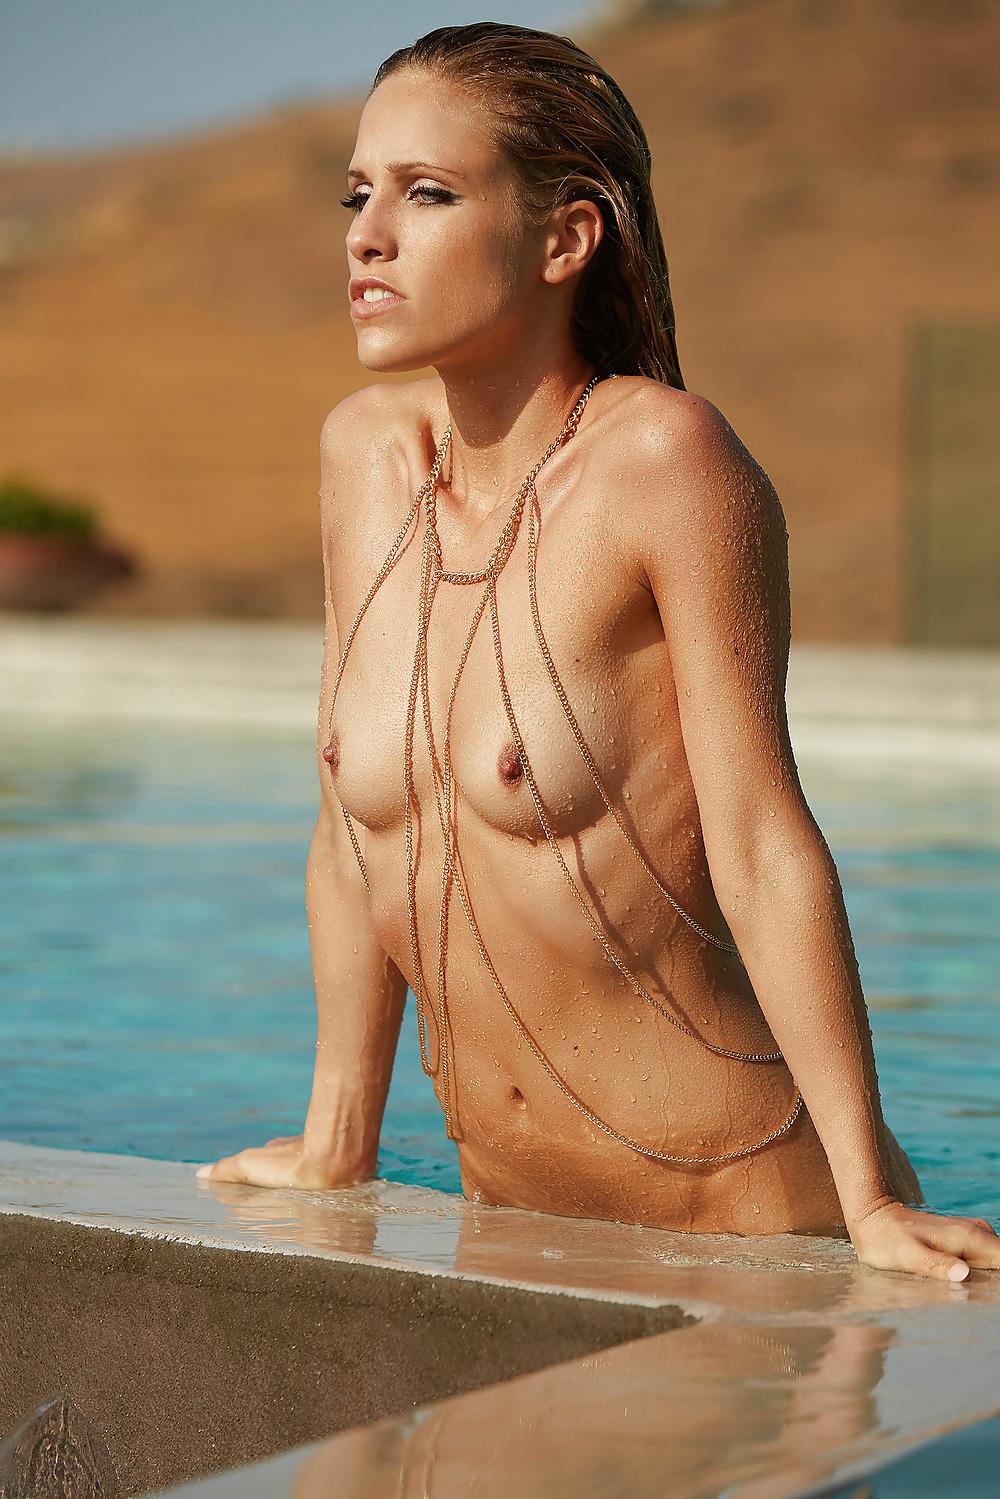 Sissi Fahrenschon Nackt. Foto - 11